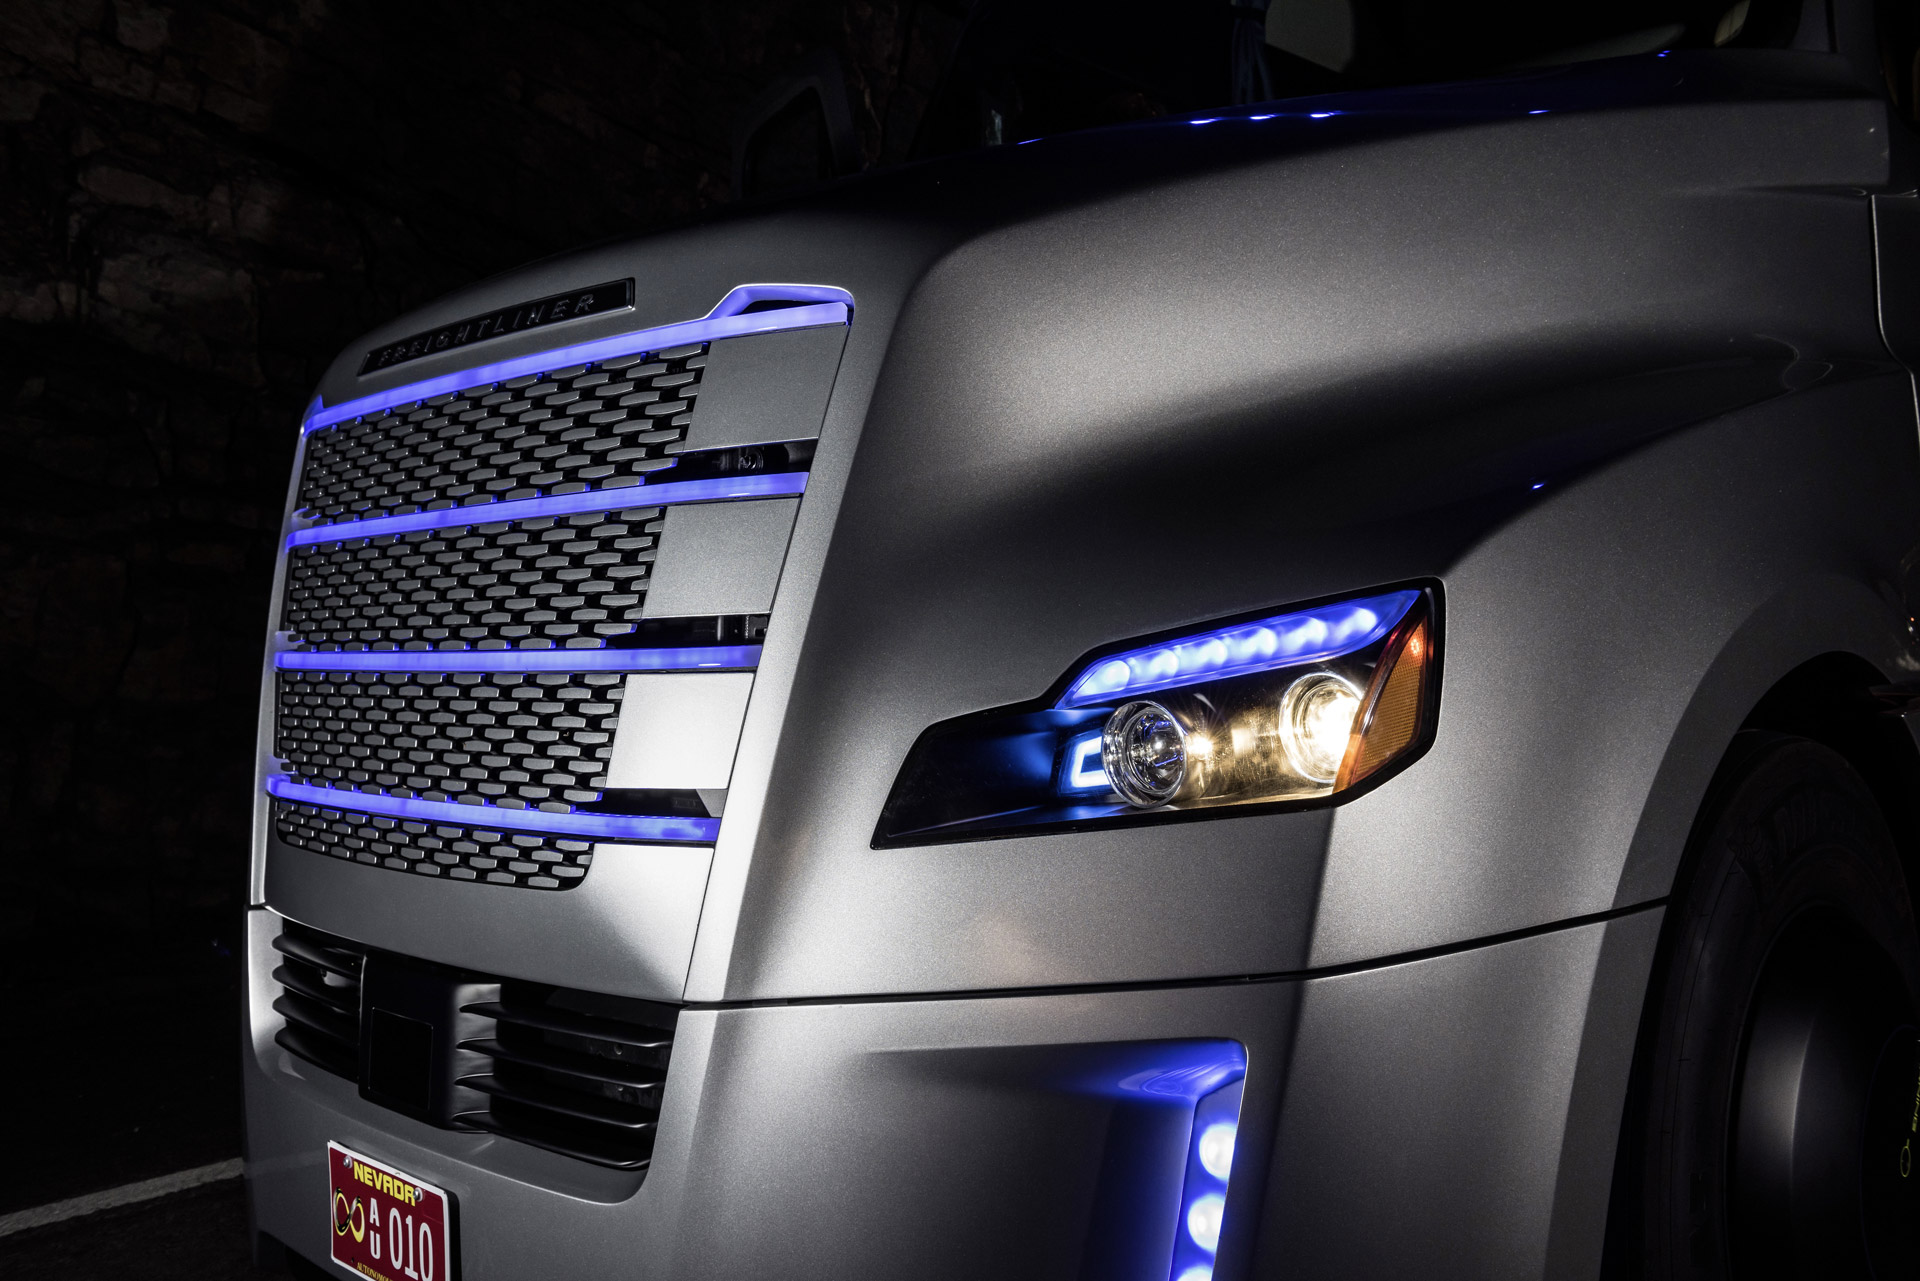 2017 Porsche Panamera, Autonomous Trucks, Tesla Selling ...